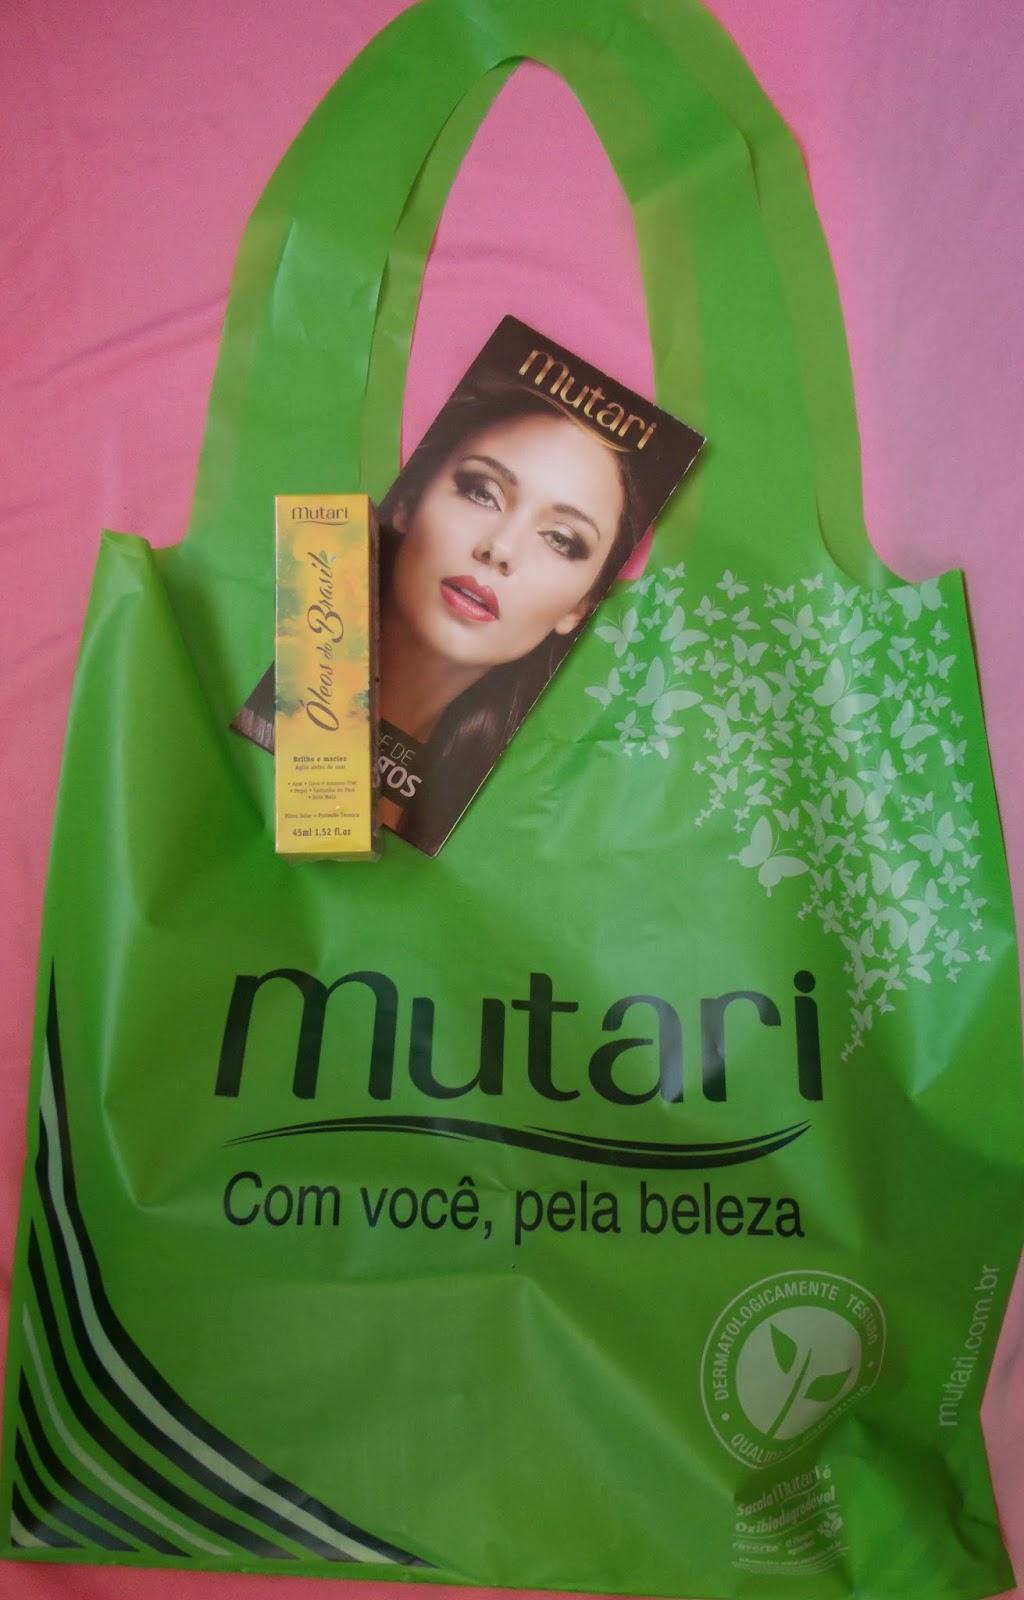 Mutari, cosmeticos profissionais, estéticos, capilares, encontro blogueira s.a., #4EBSA